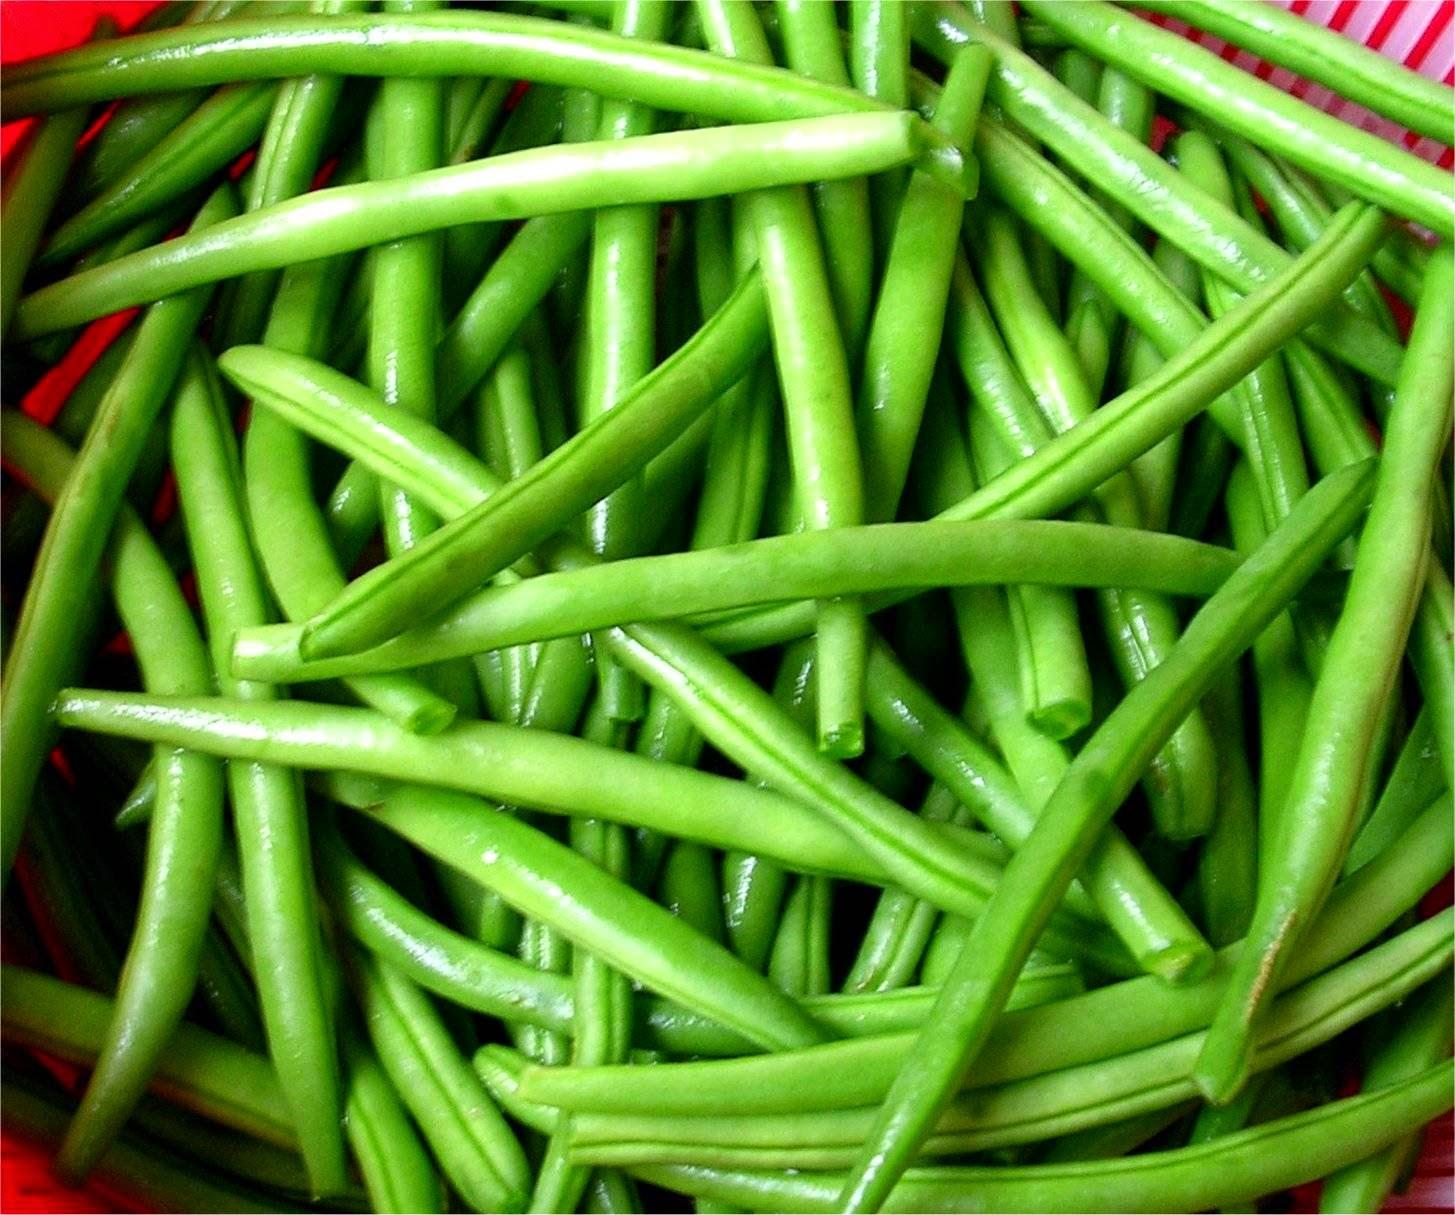 manfaat sayur buncis